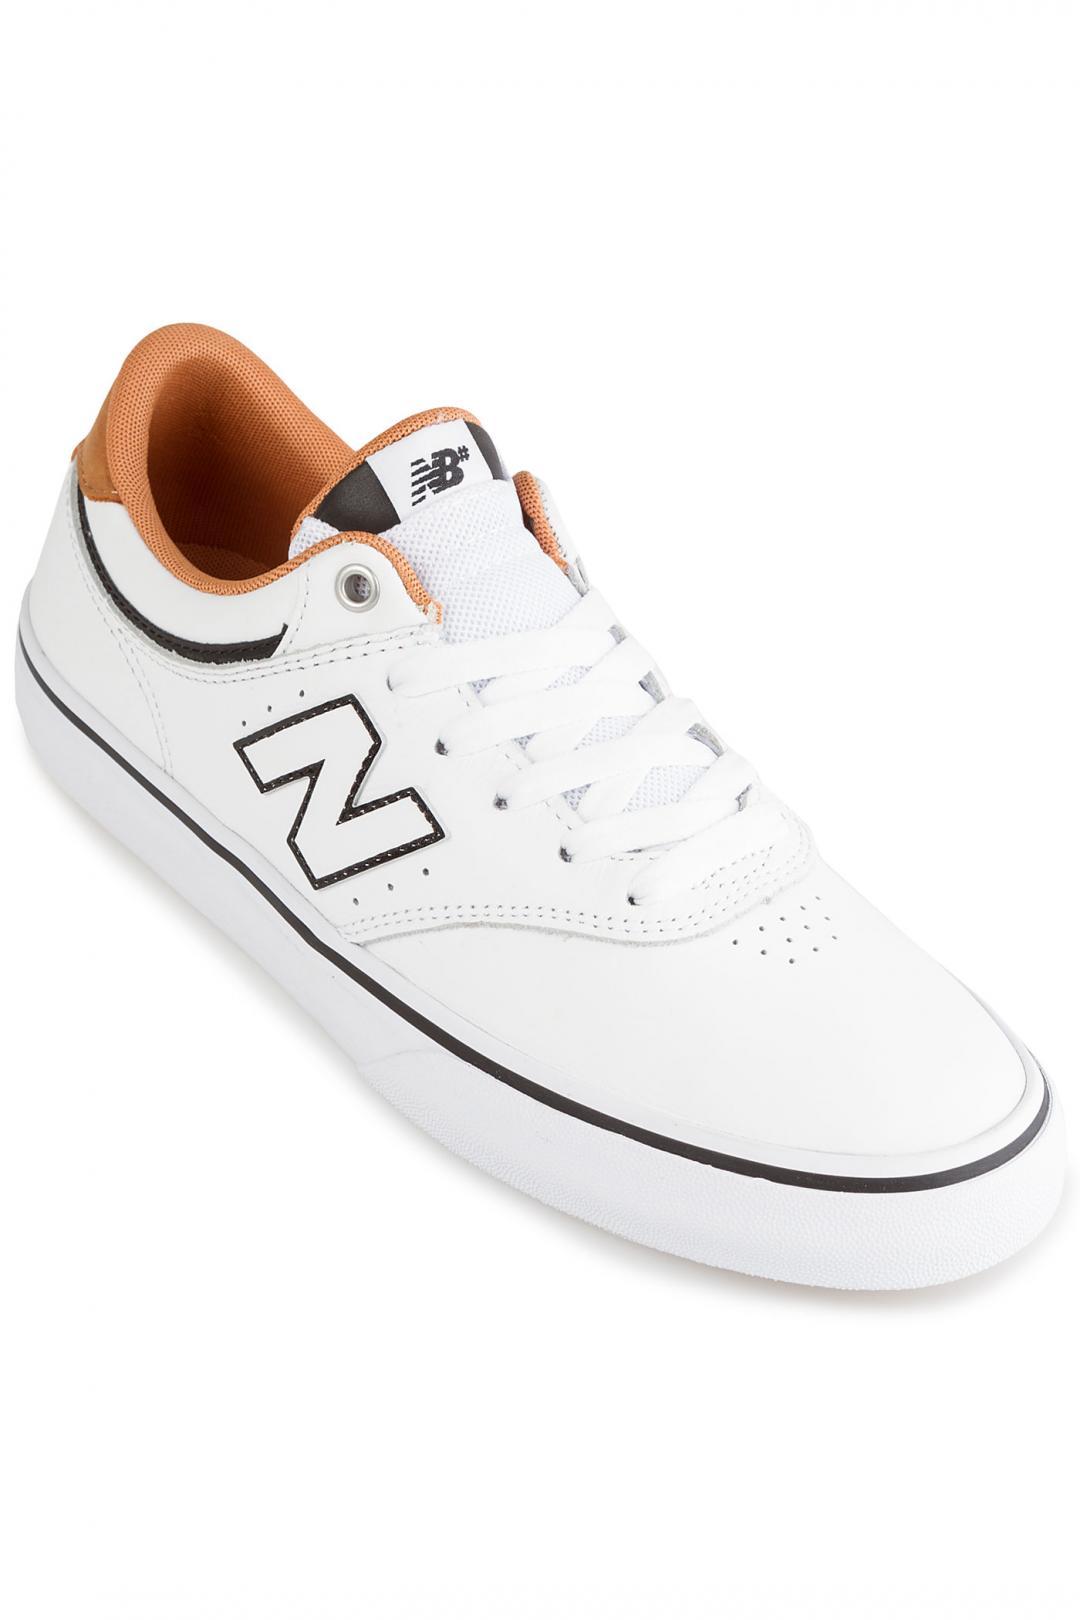 Uomo New Balance Numeric 255 white blue | Sneaker